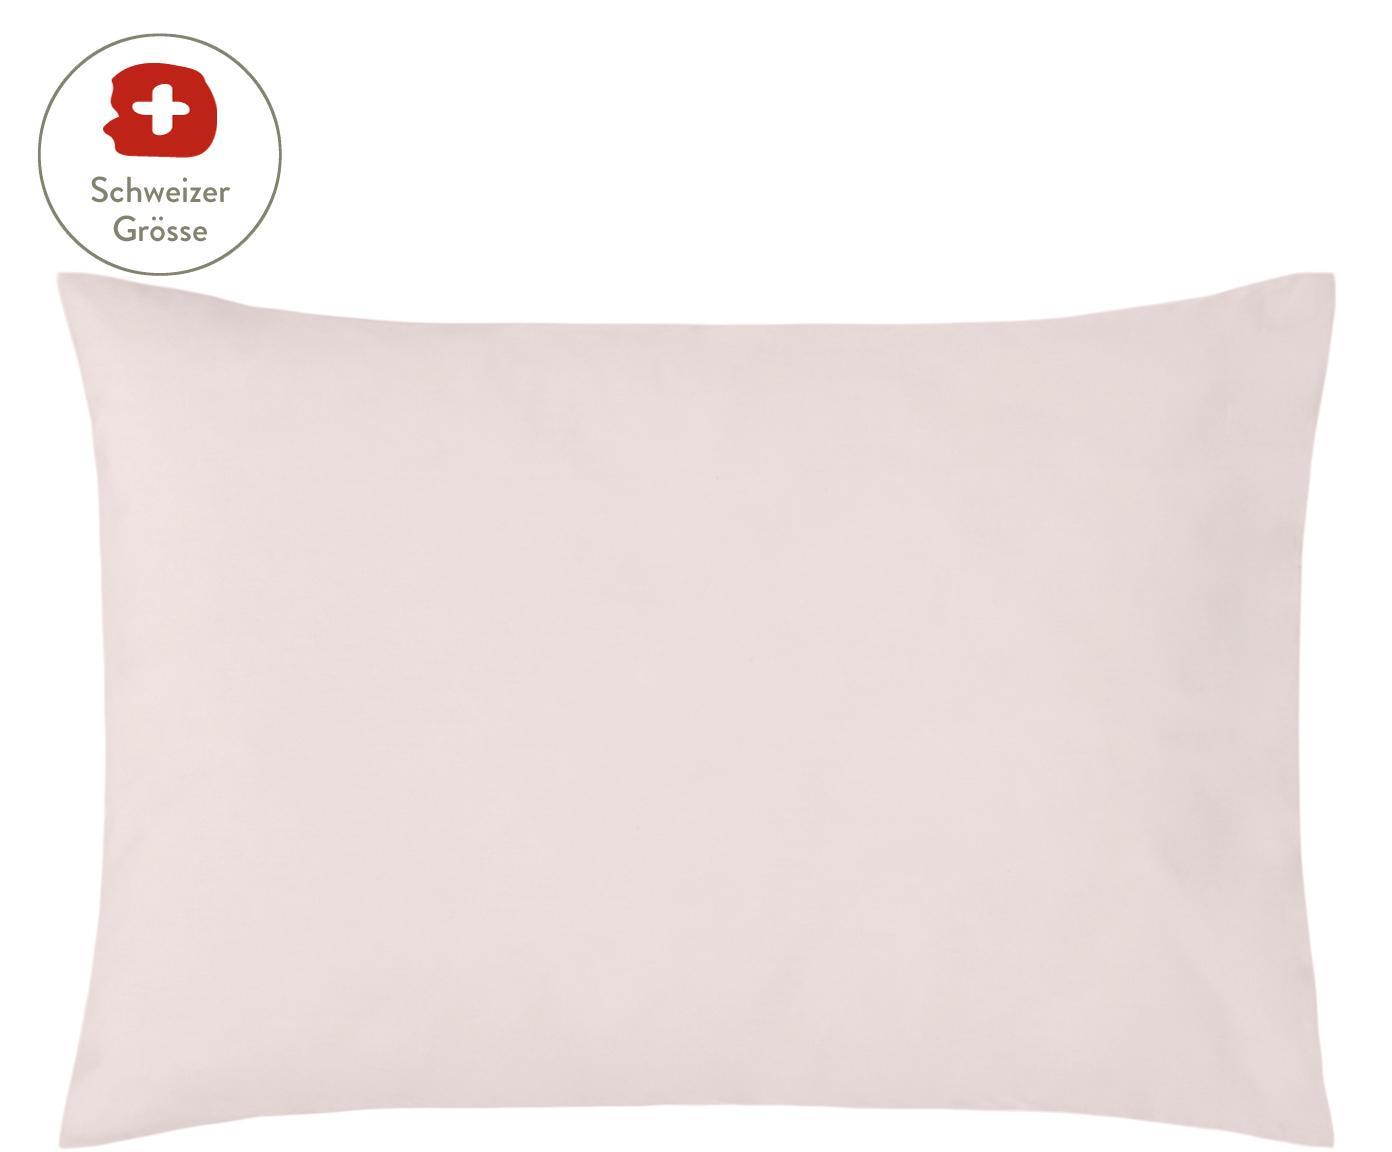 Baumwollperkal-Kissenbezug Elsie in Rosa, Webart: Perkal Fadendichte 200 TC, Rosa, 50 x 70 cm